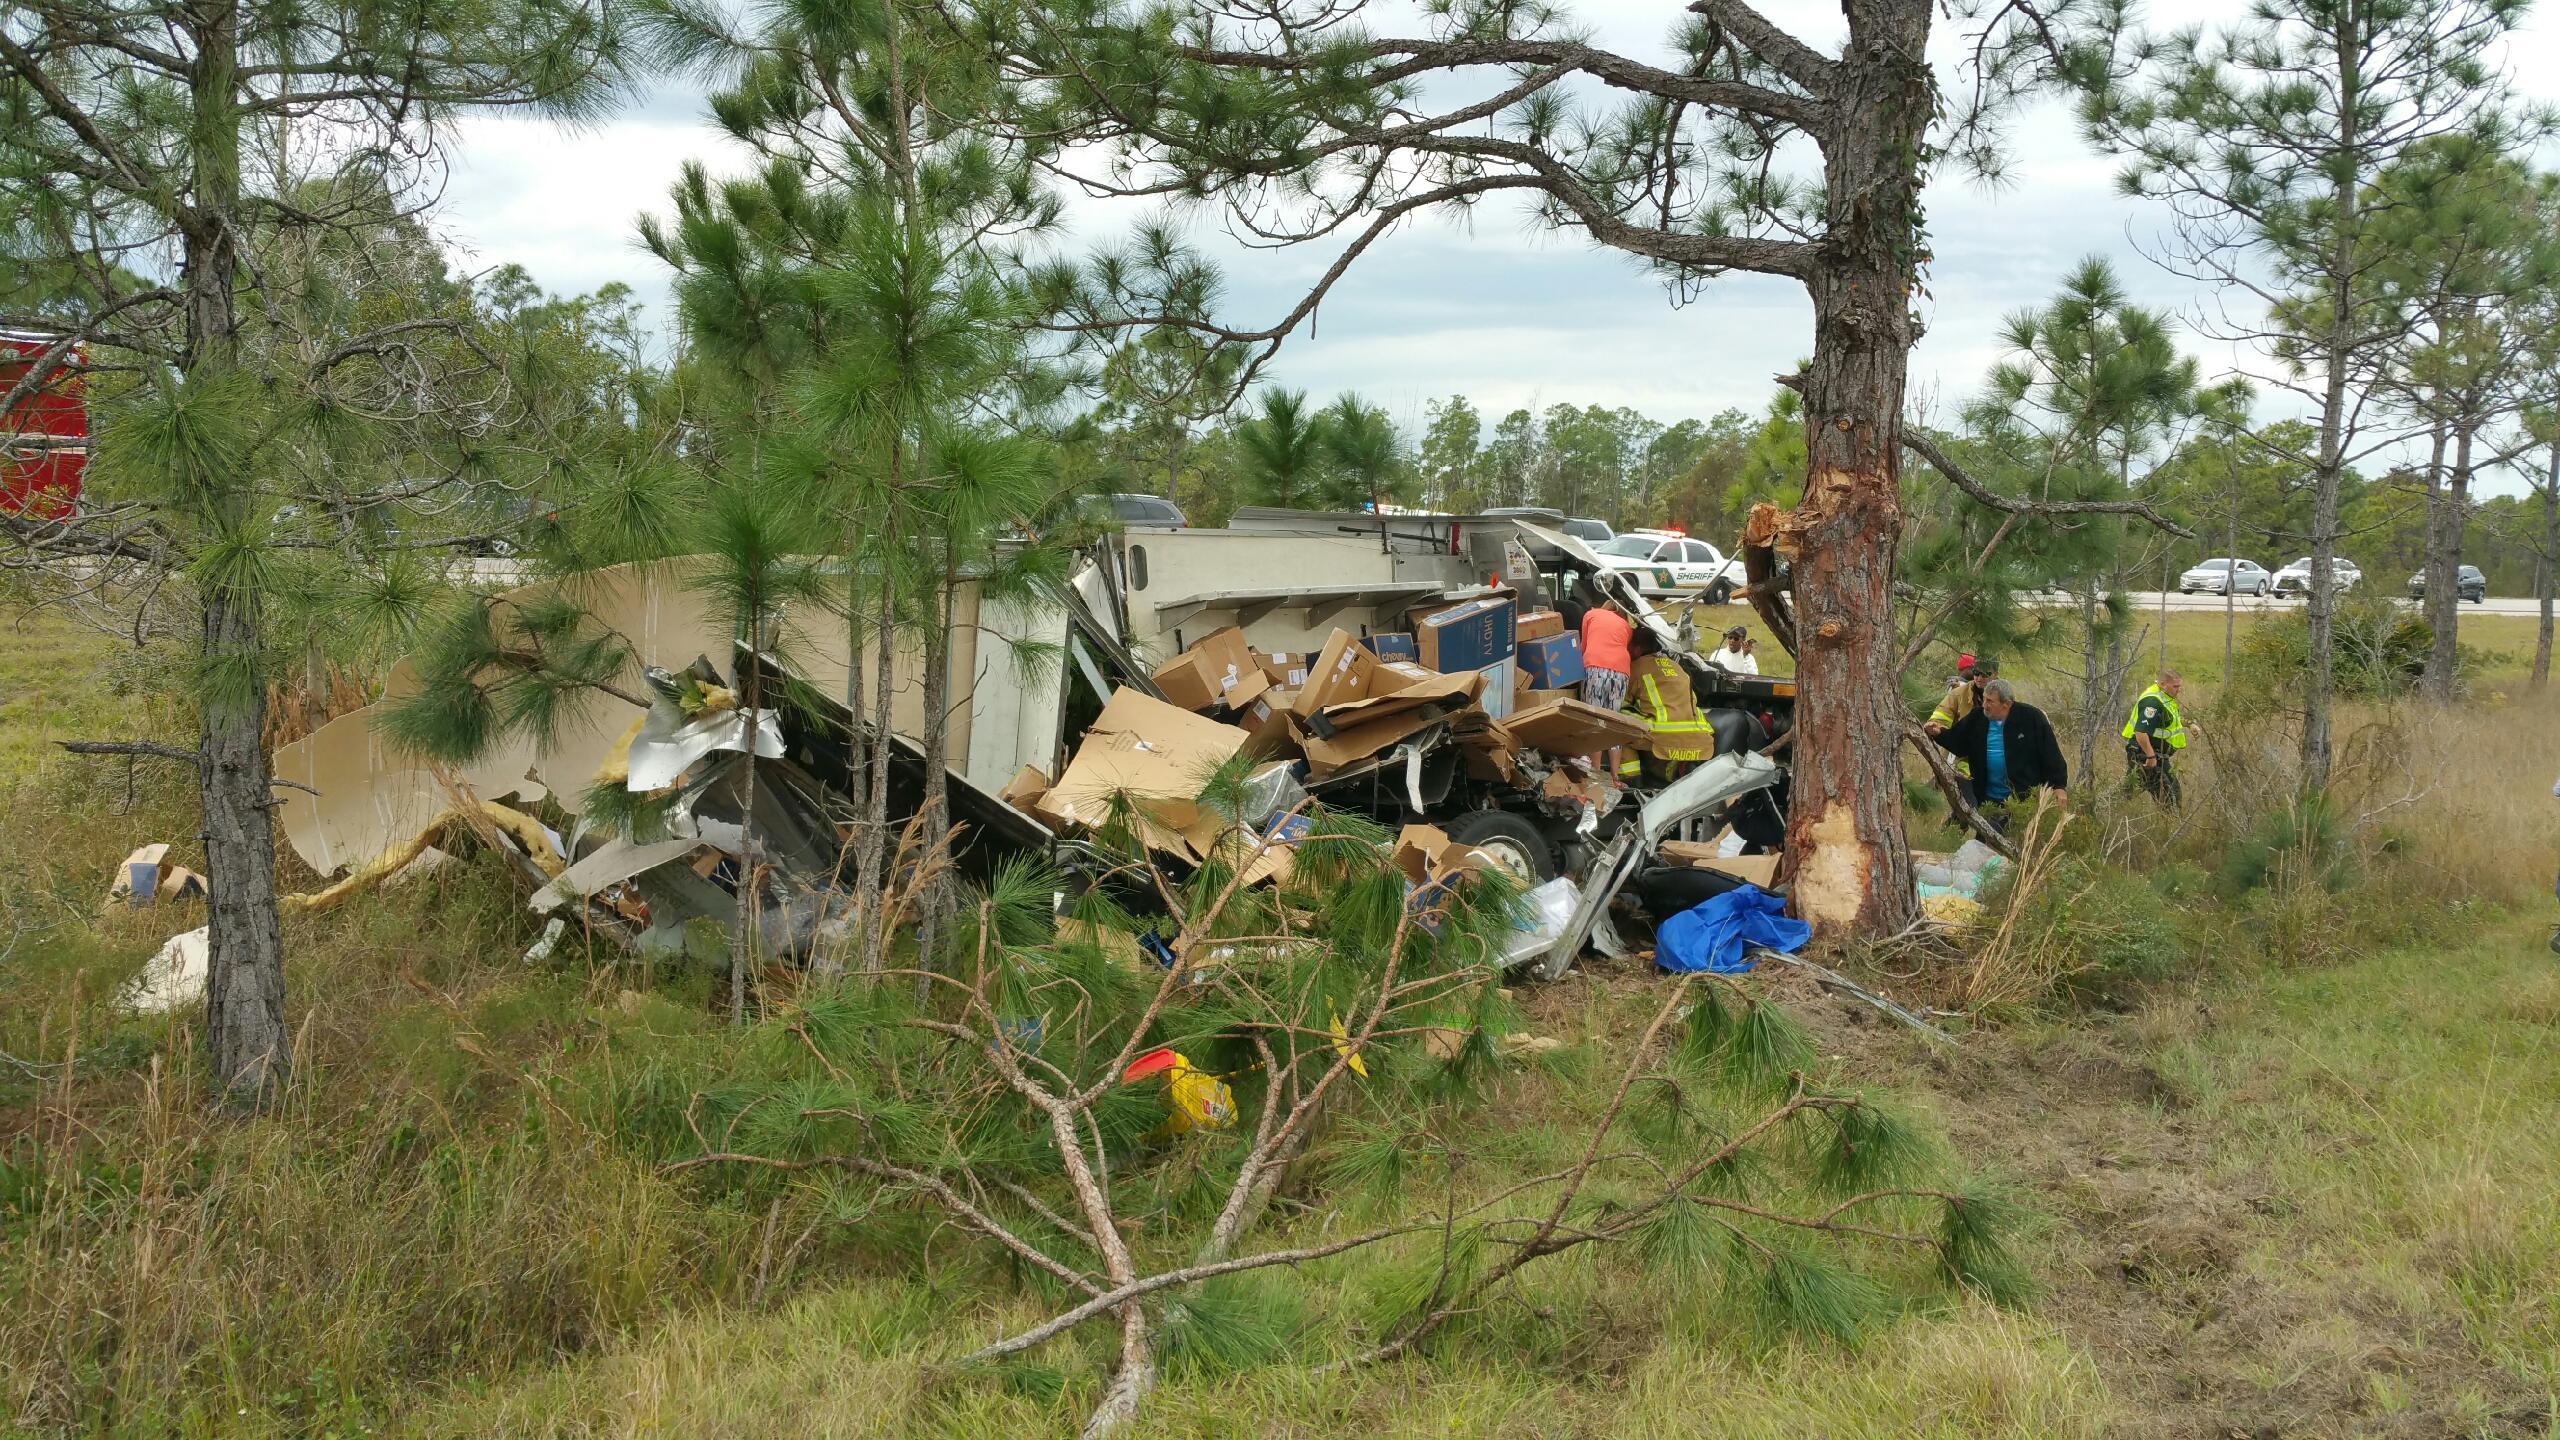 FedEx truck crash on northbound I-75 in Punta Gorda causing